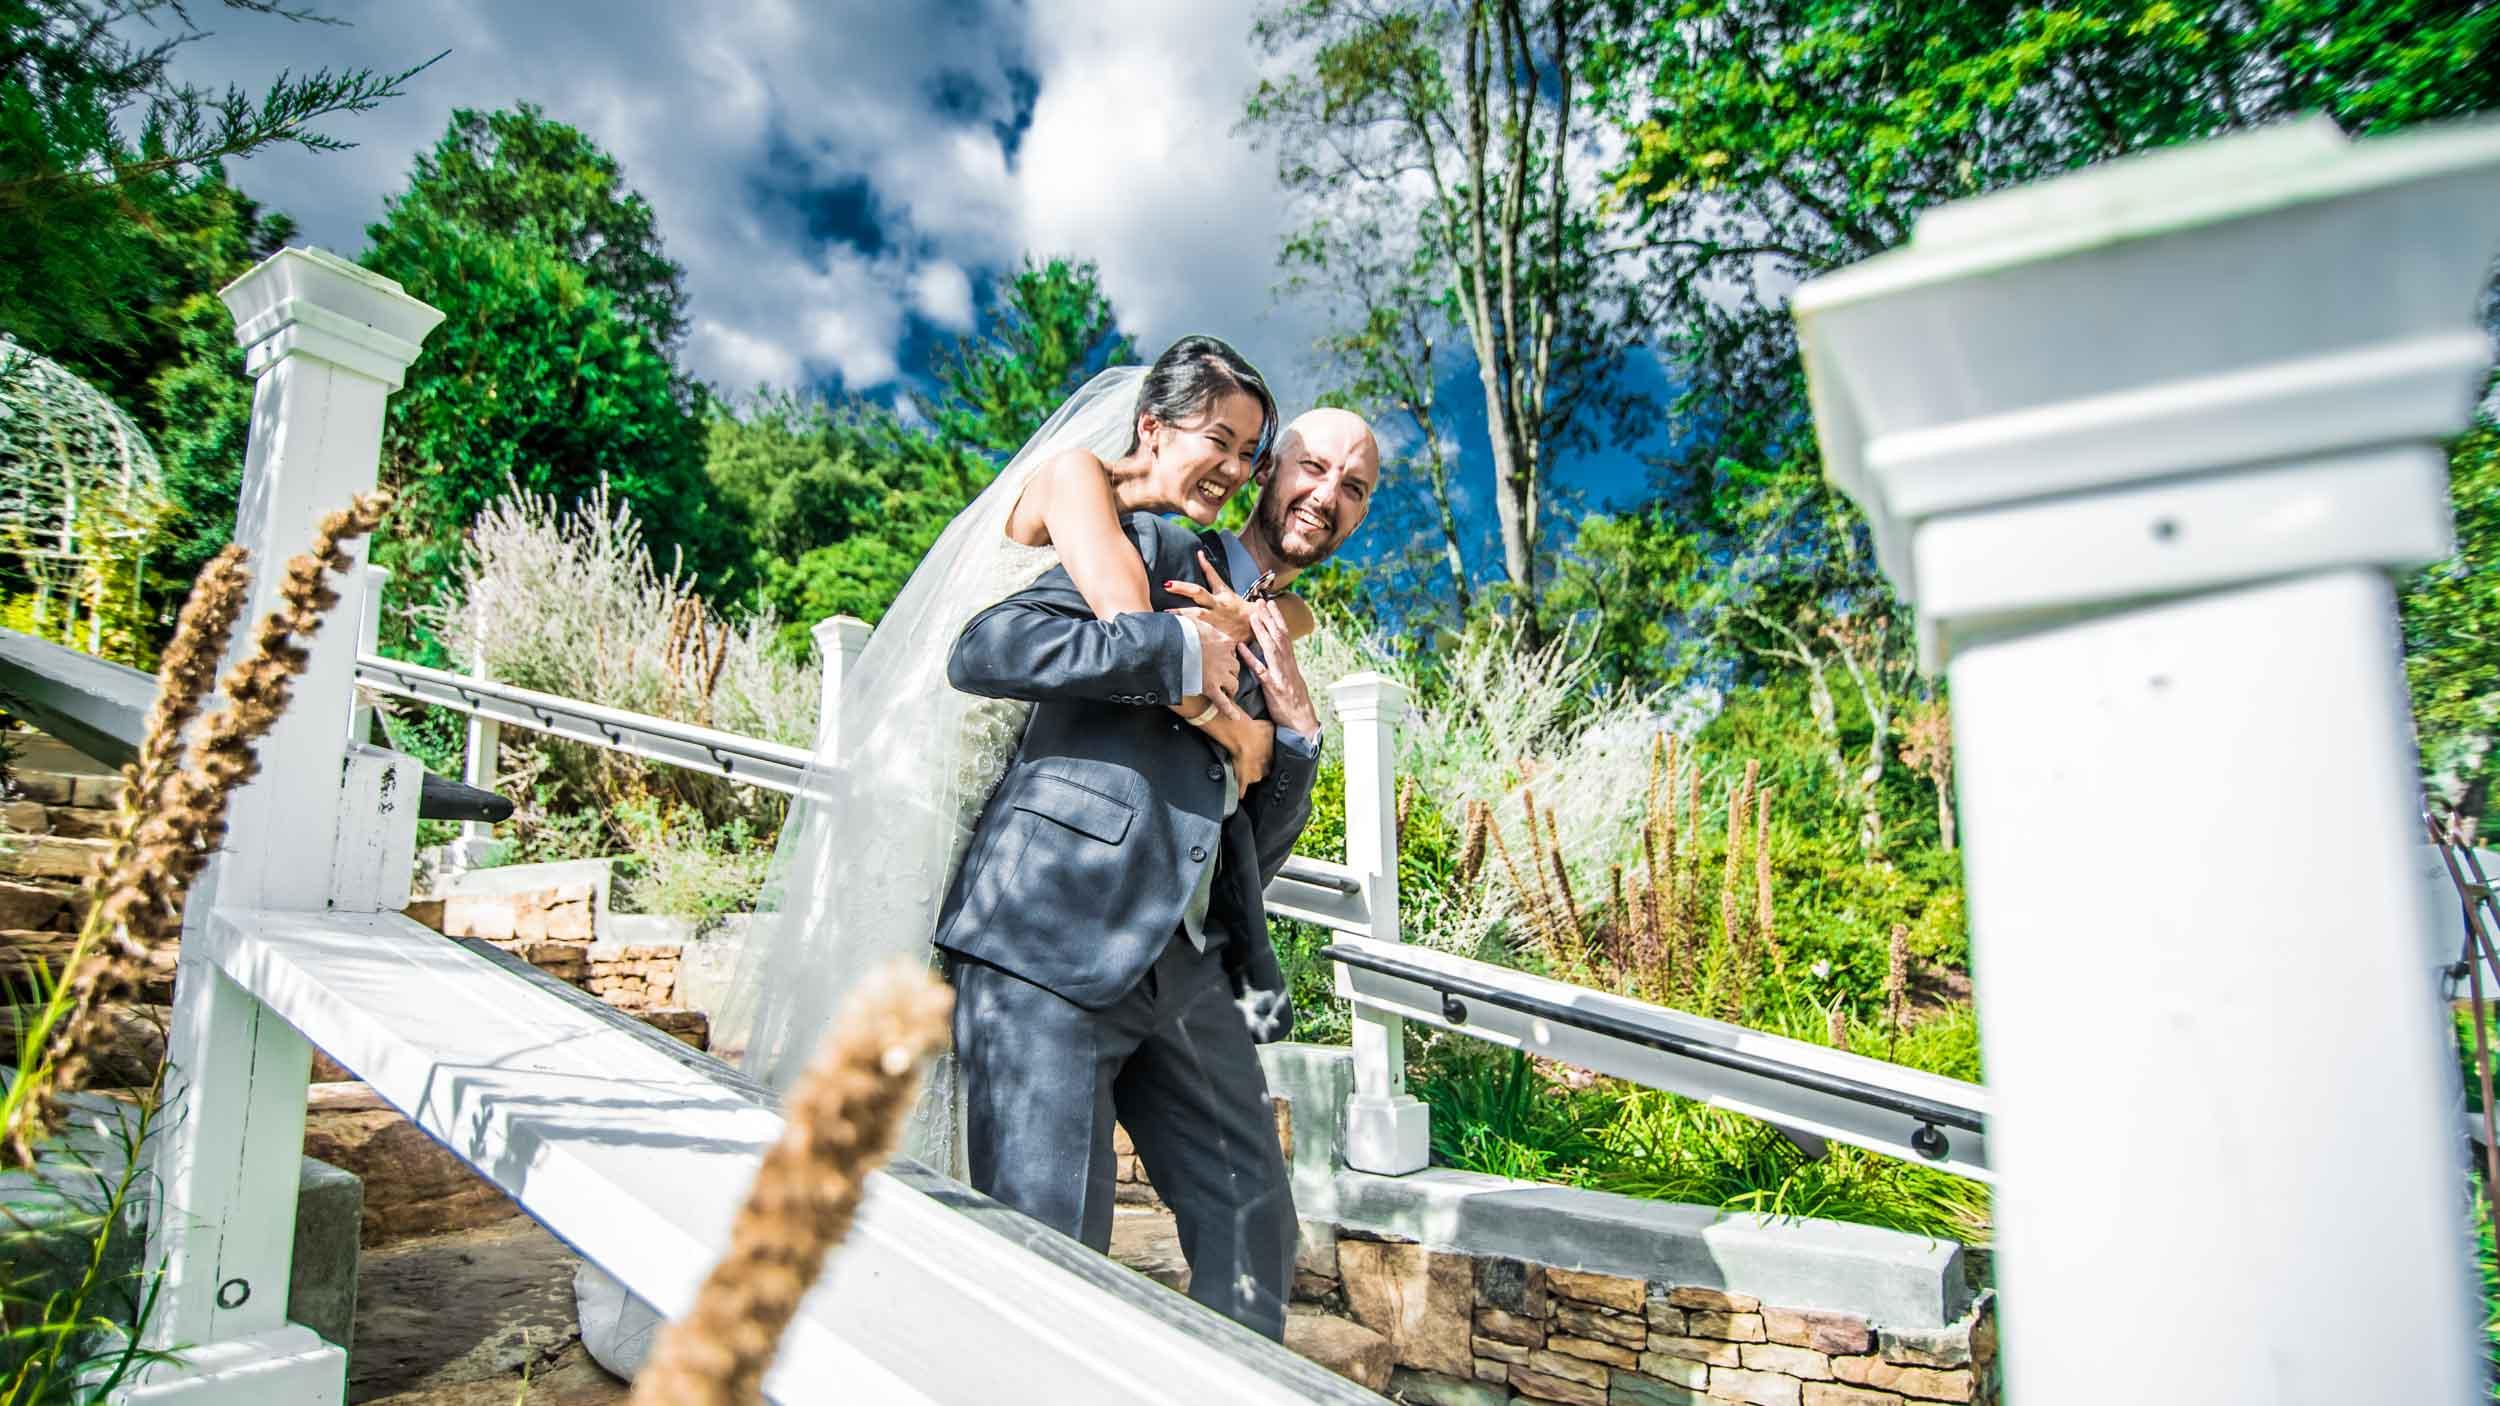 dc+metro+wedding+photographer+vadym+guliuk+photography+wedding+bride+and+groom-2060.jpg